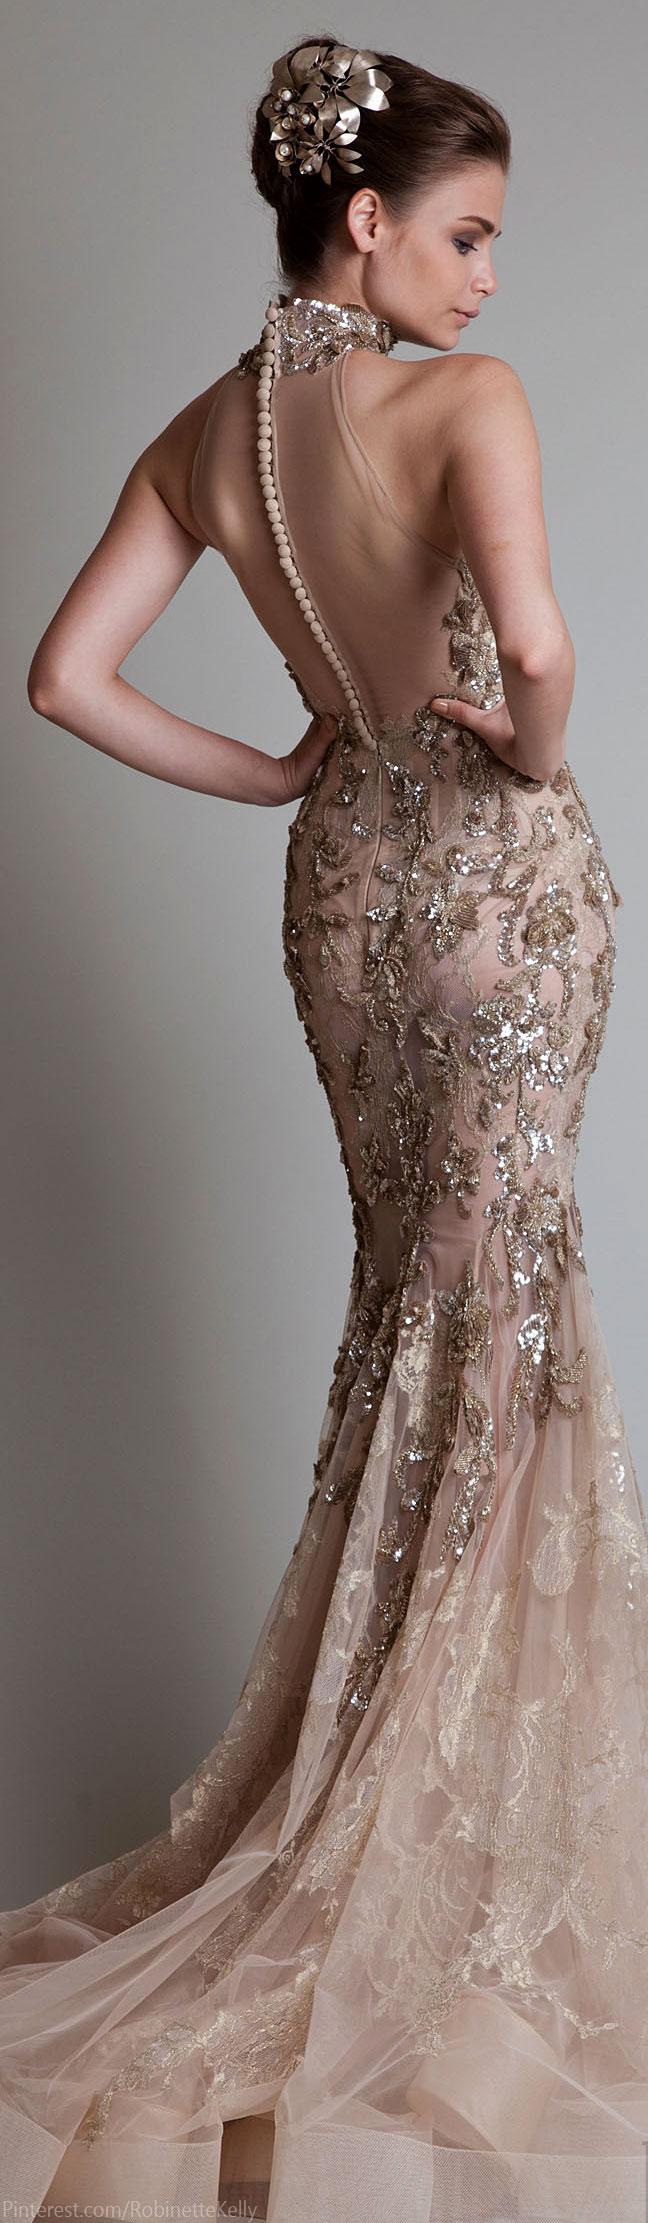 Krikor jabotian couture beautiful things pinterest perly